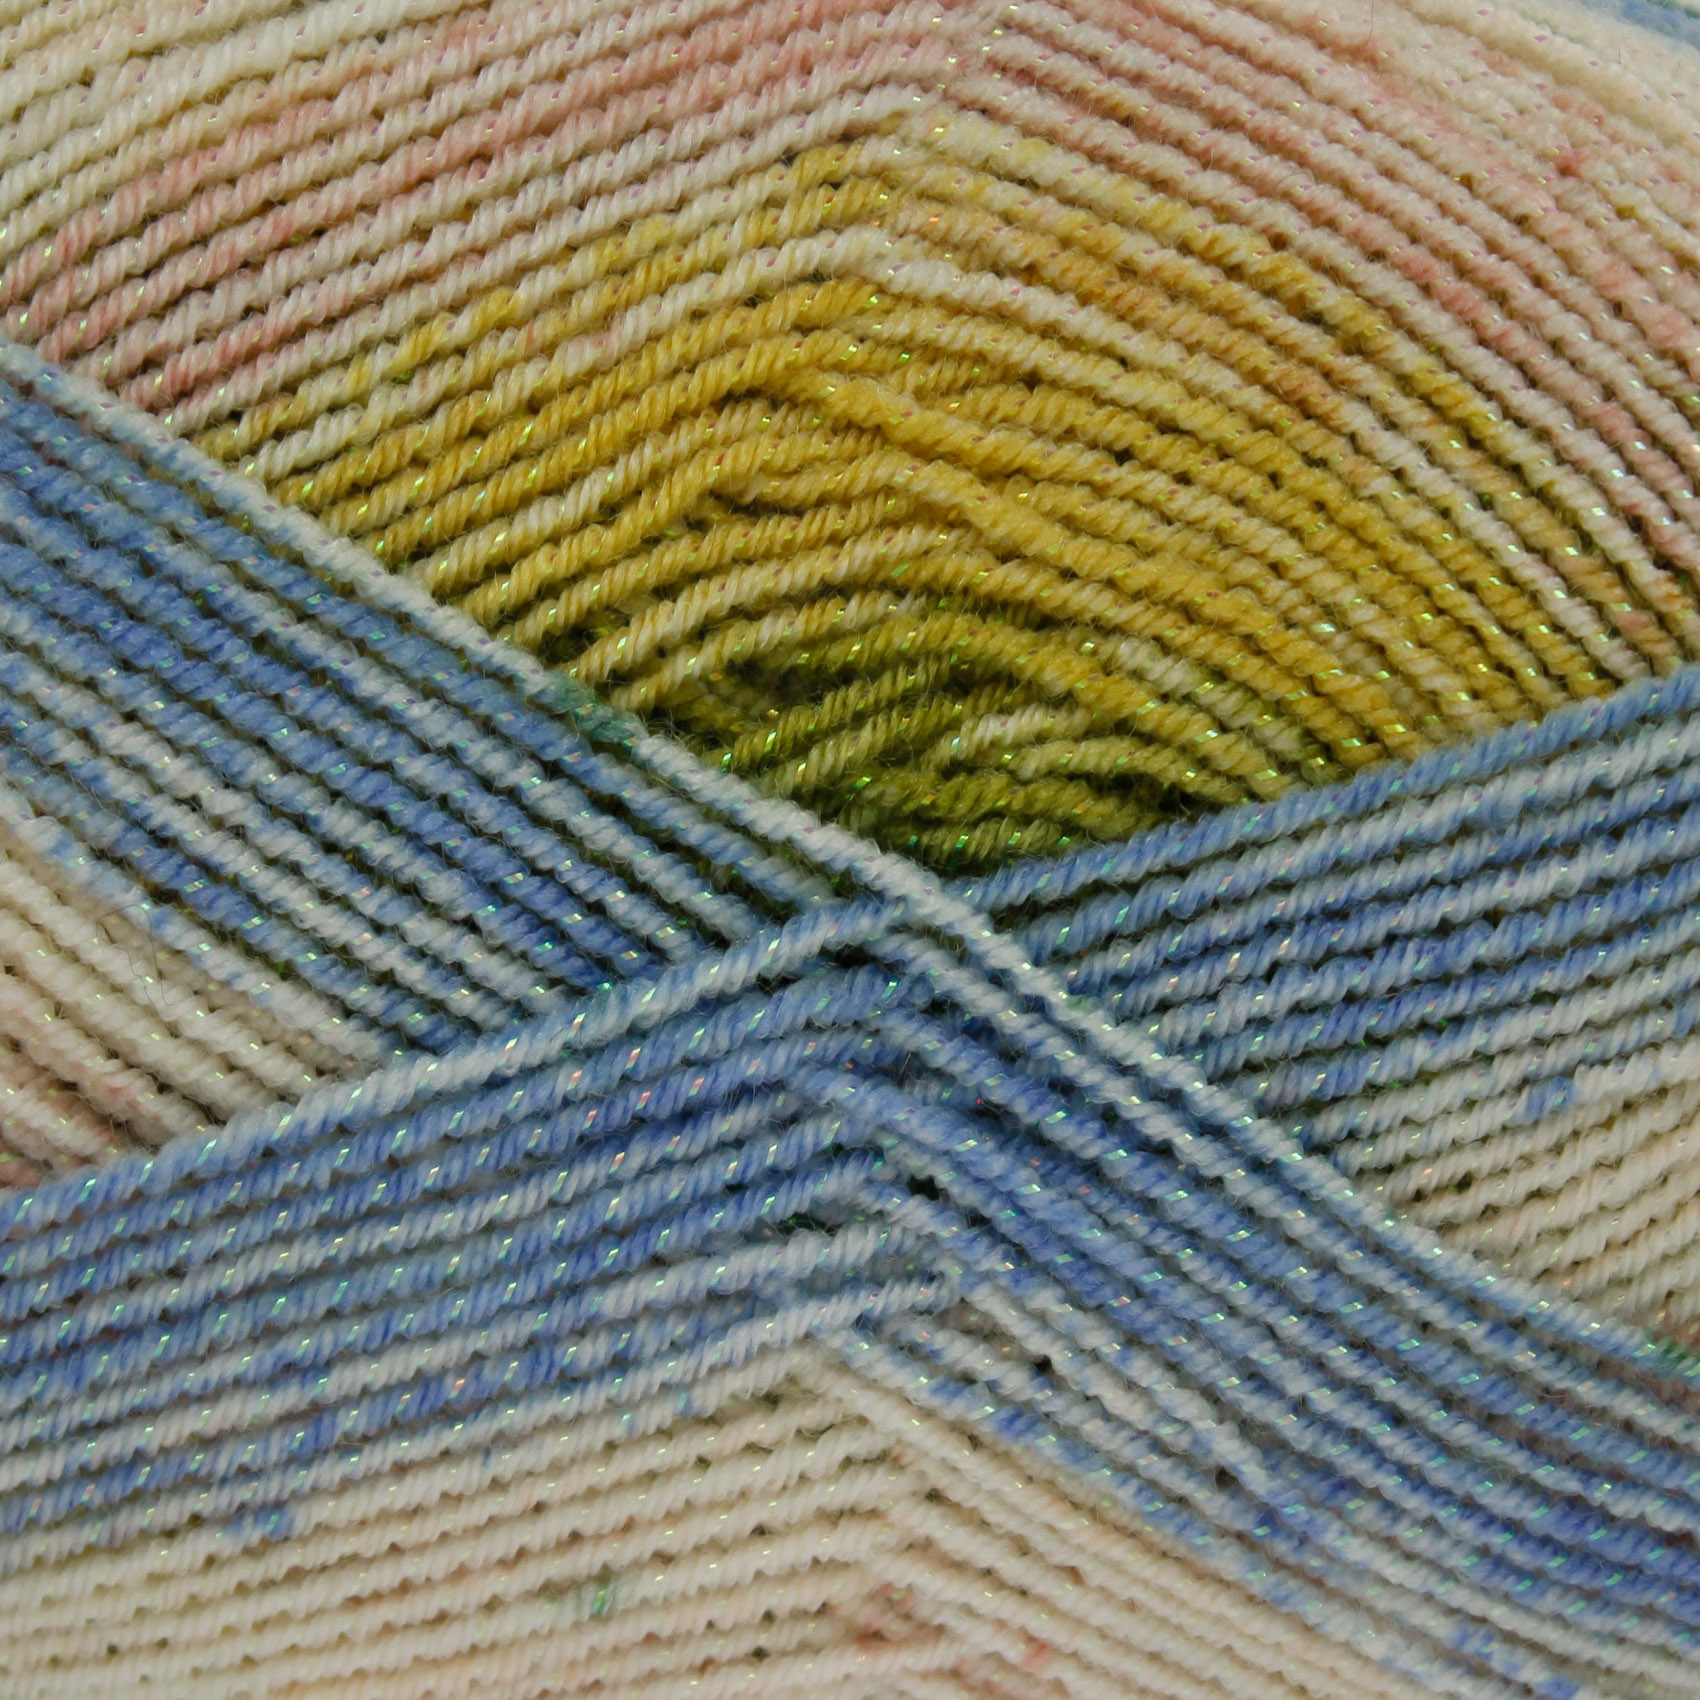 Free King Cole Knitting Patterns : King Cole Shine DK Acrylic Blend Wool Double Knitting 100g Ball Free Pattern ...